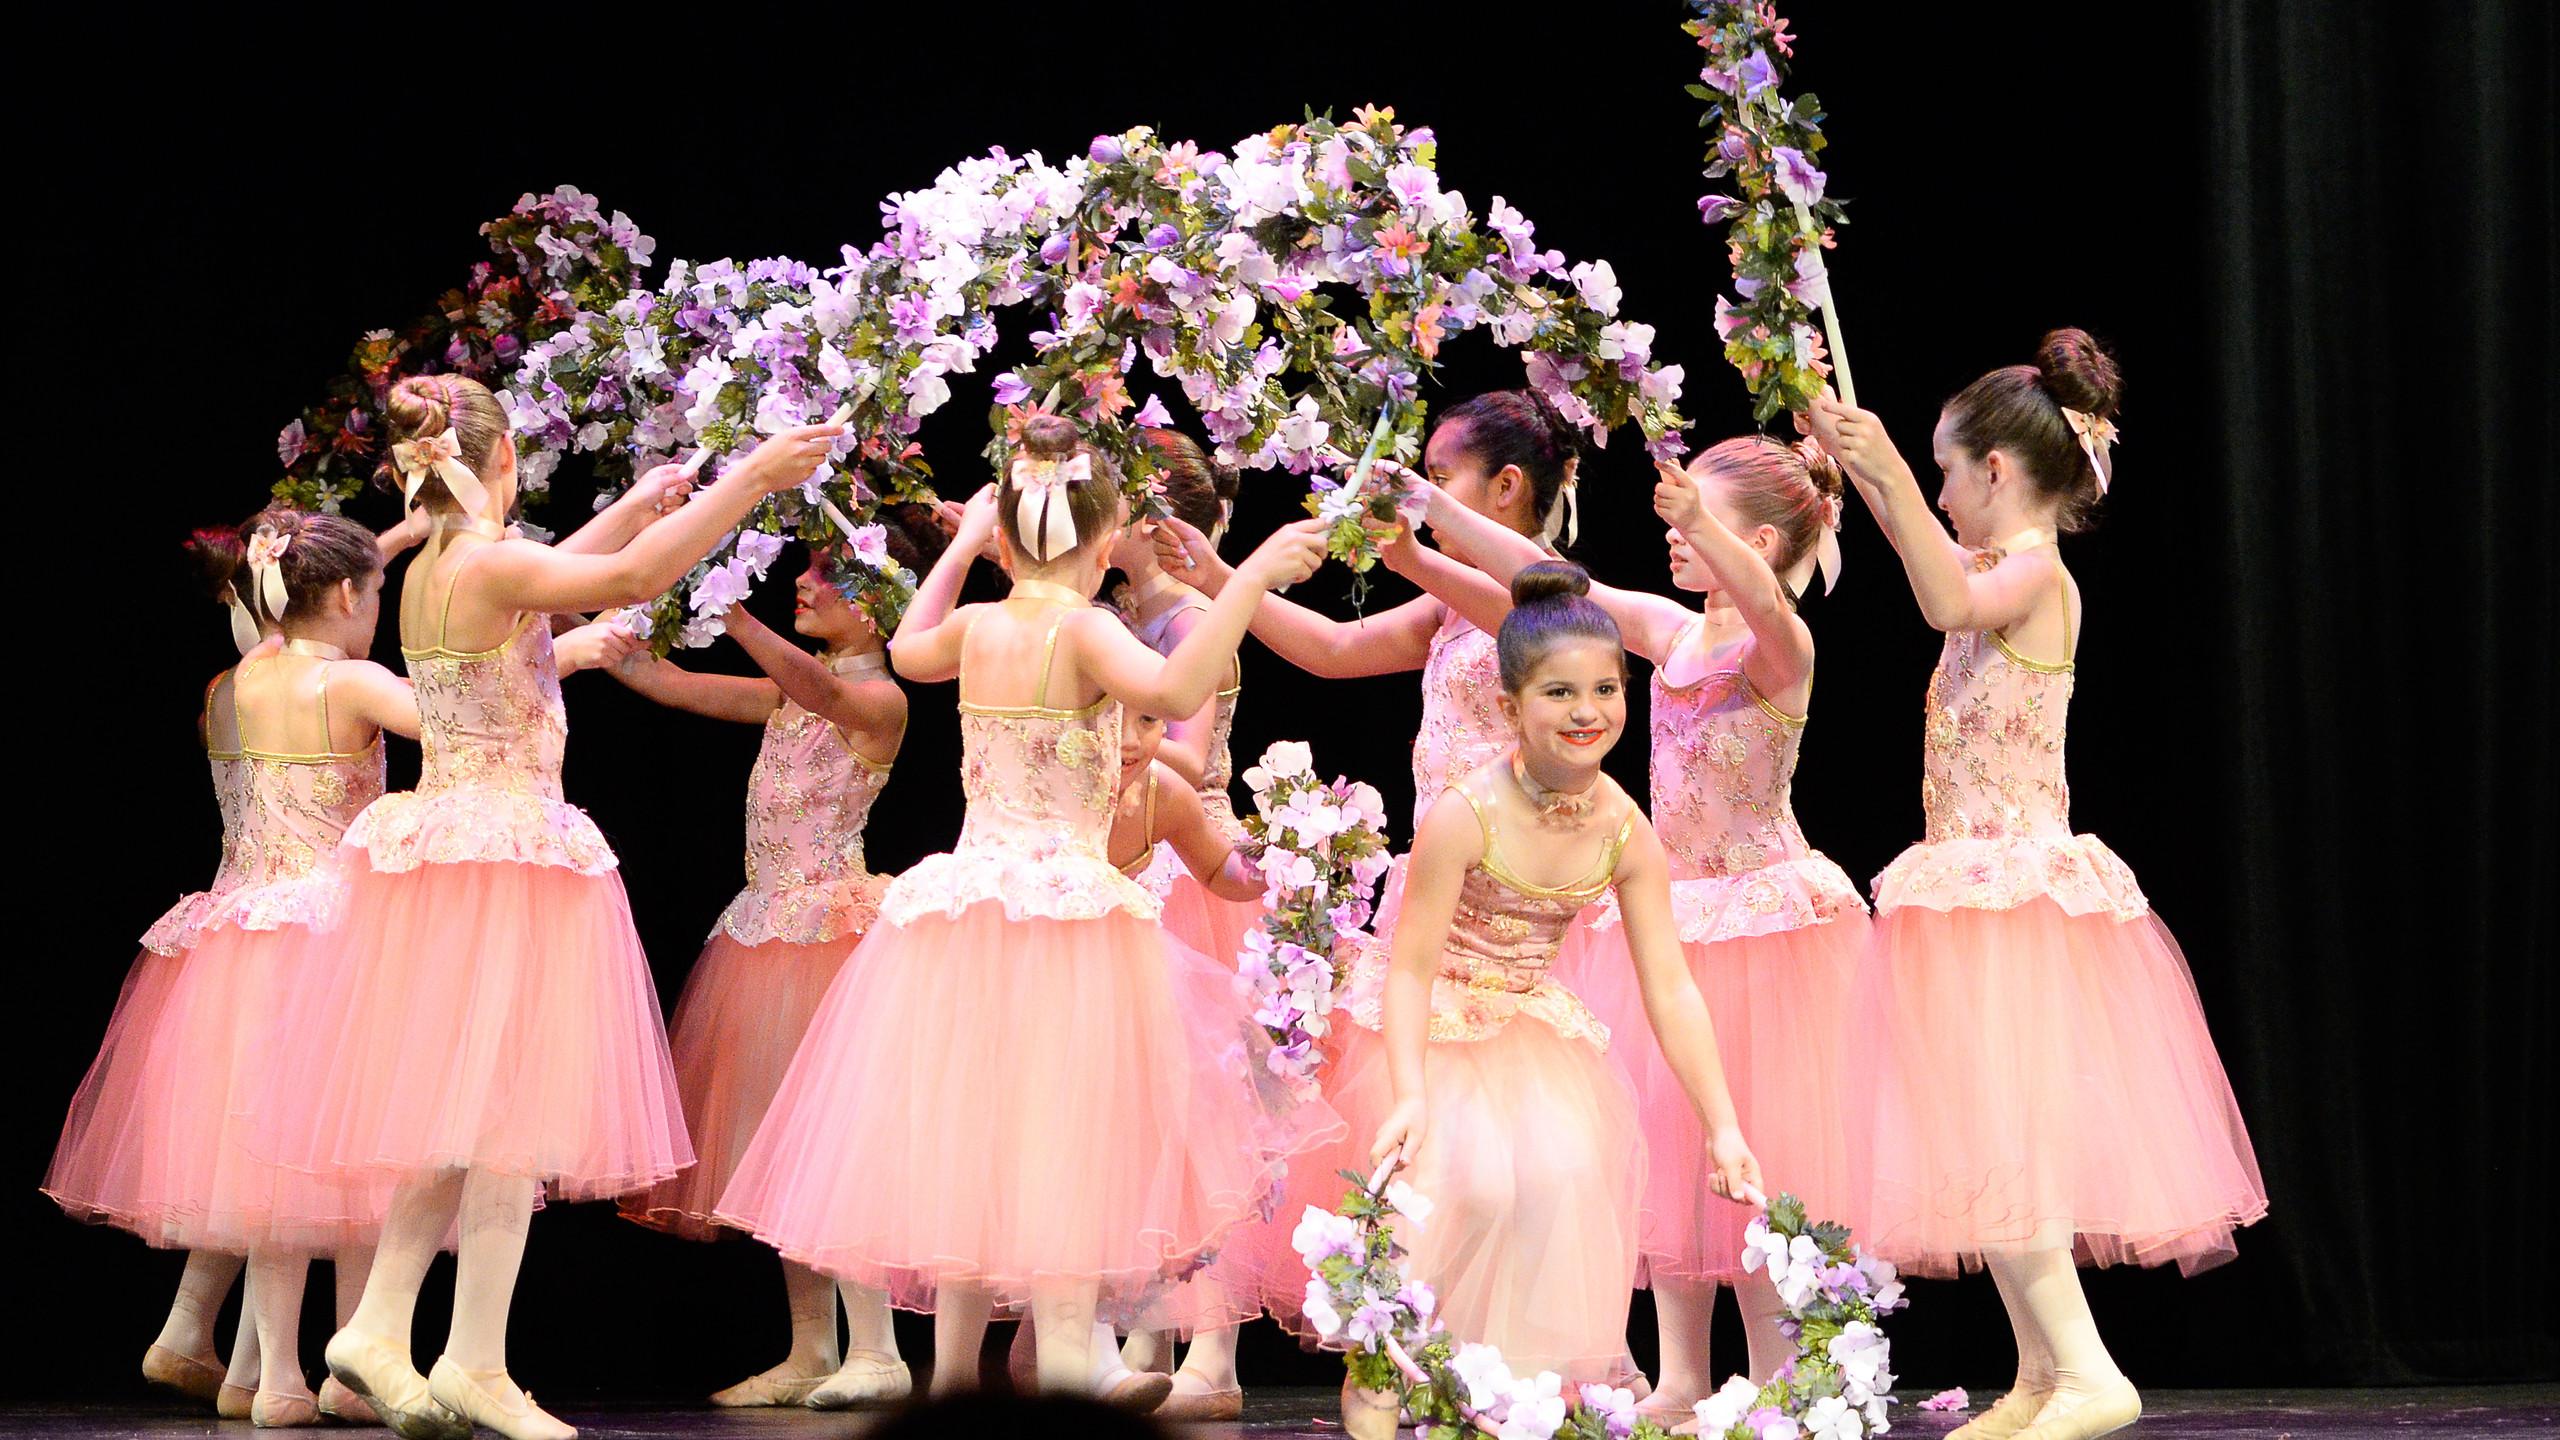 Sleeping Beauty famous garland dance